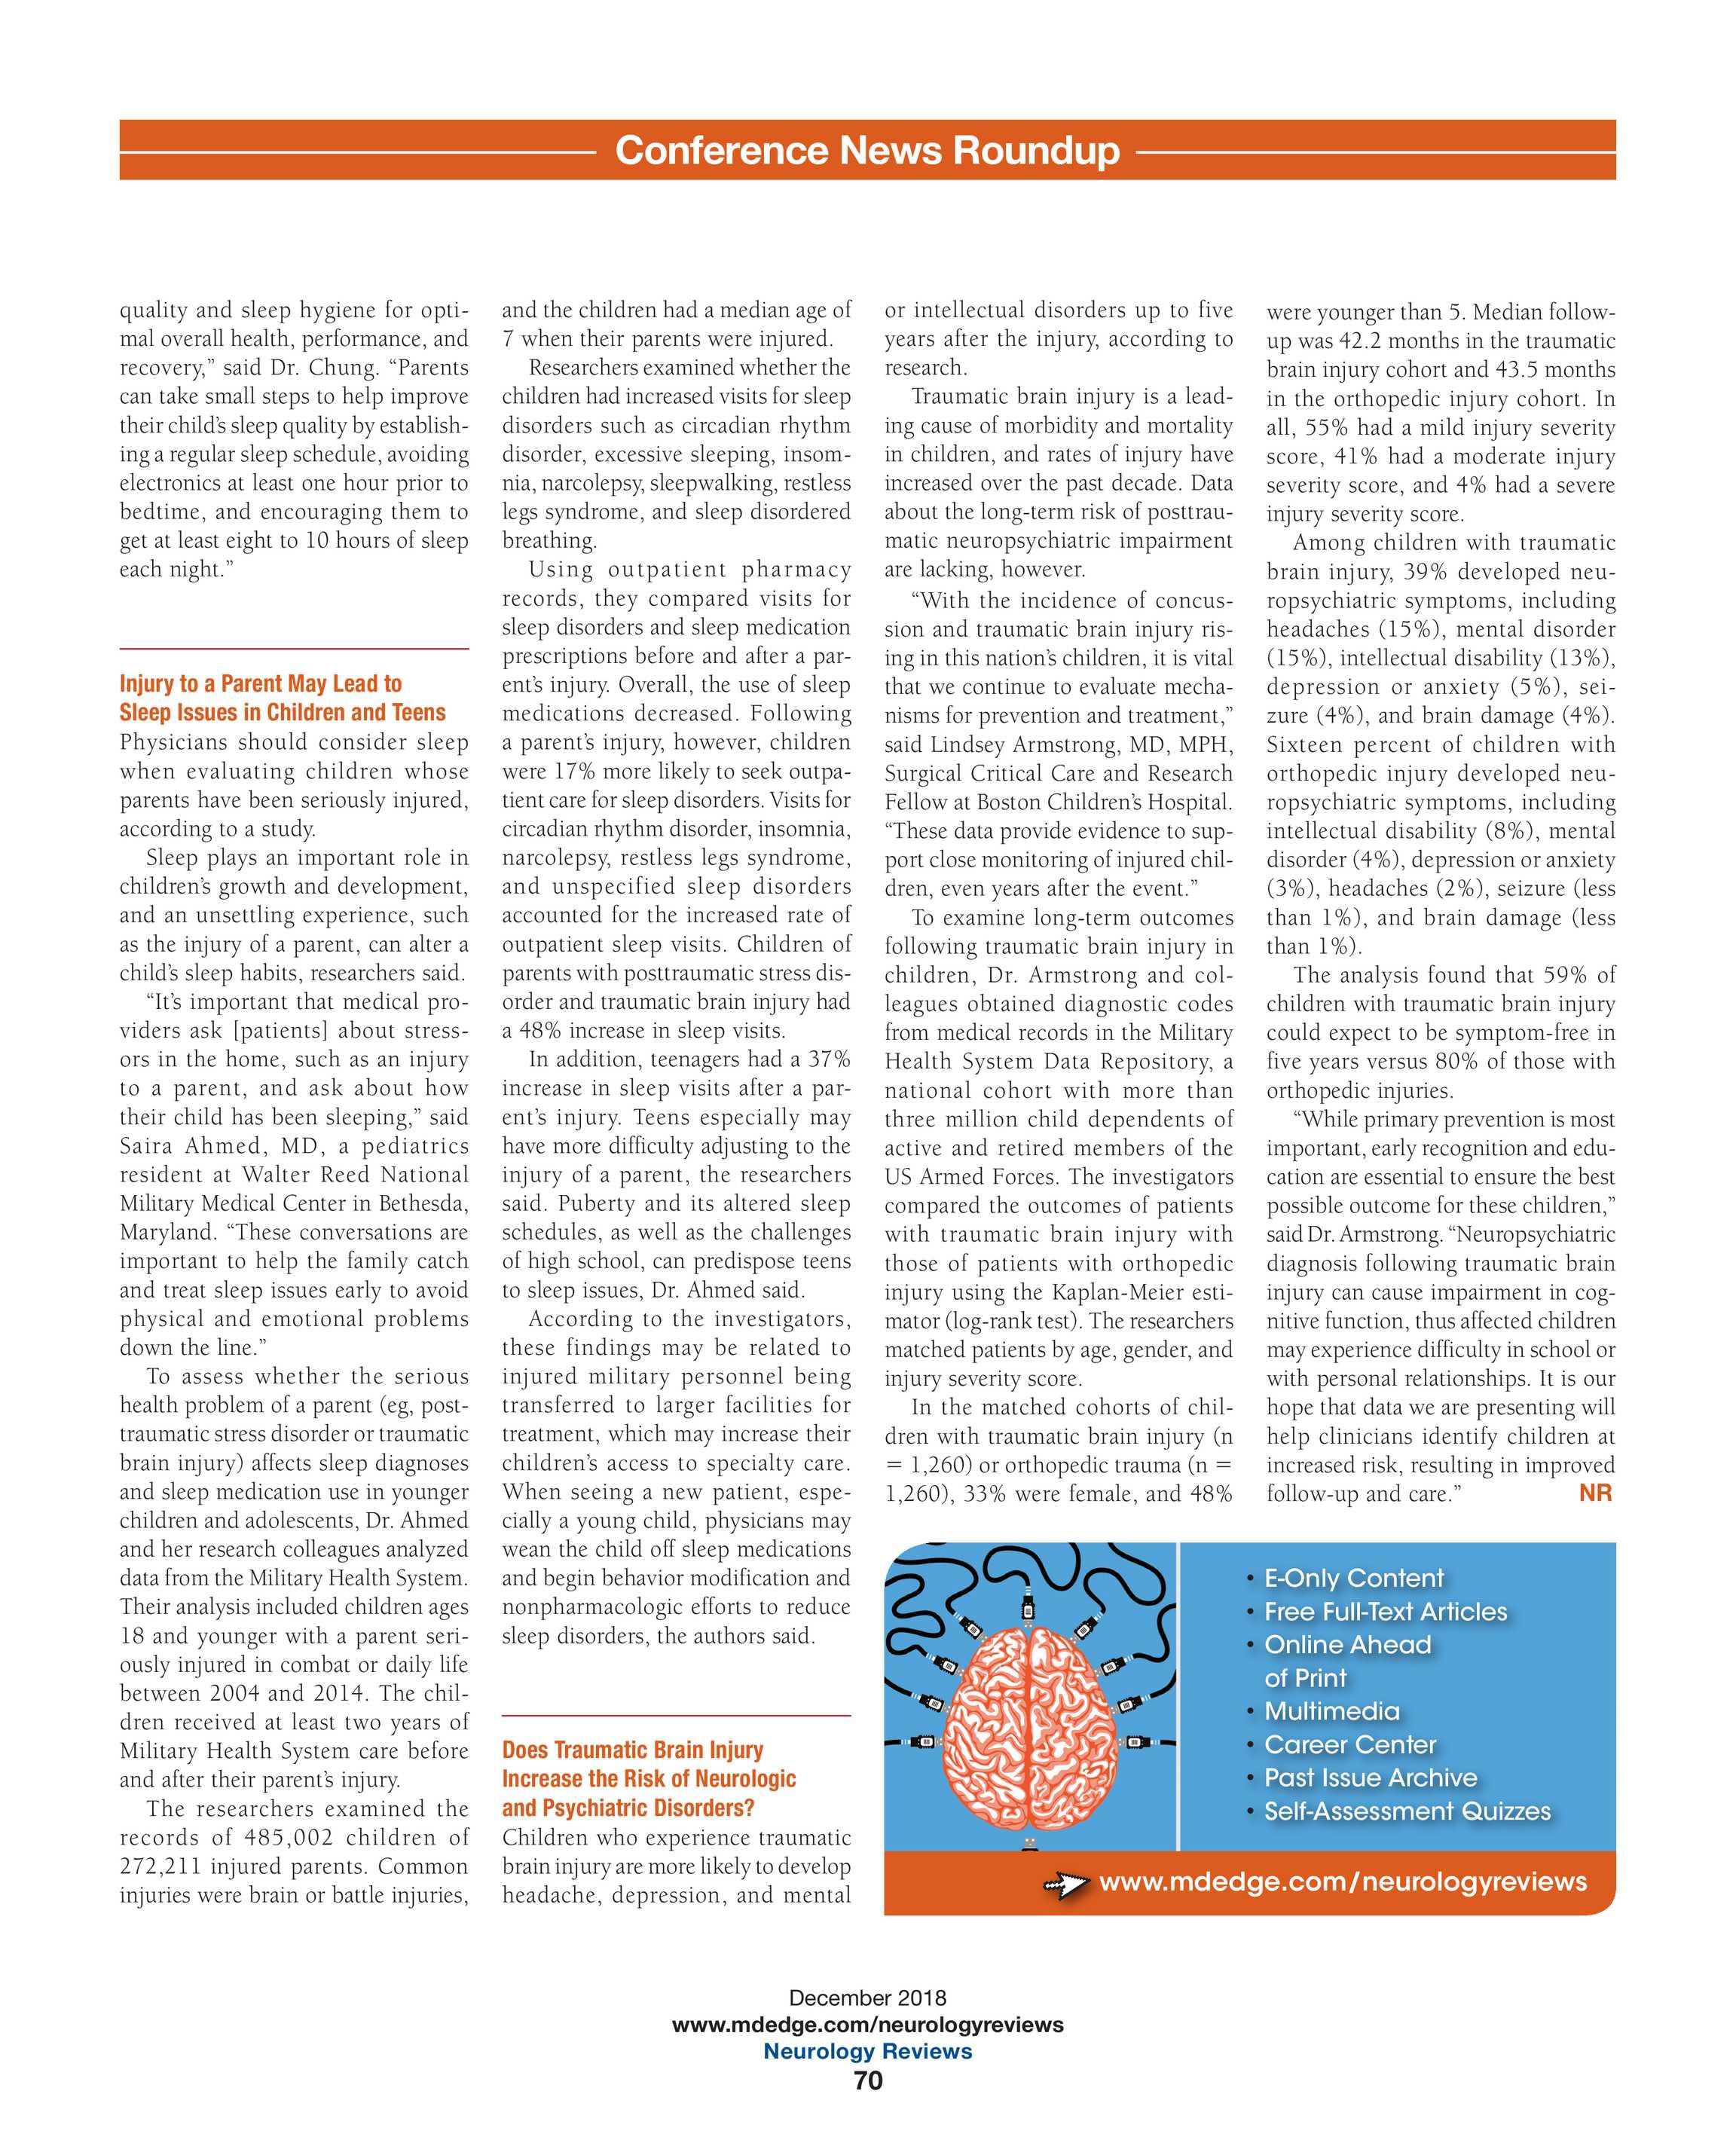 Neurology Reviews - NR DEC 2018 - page 70